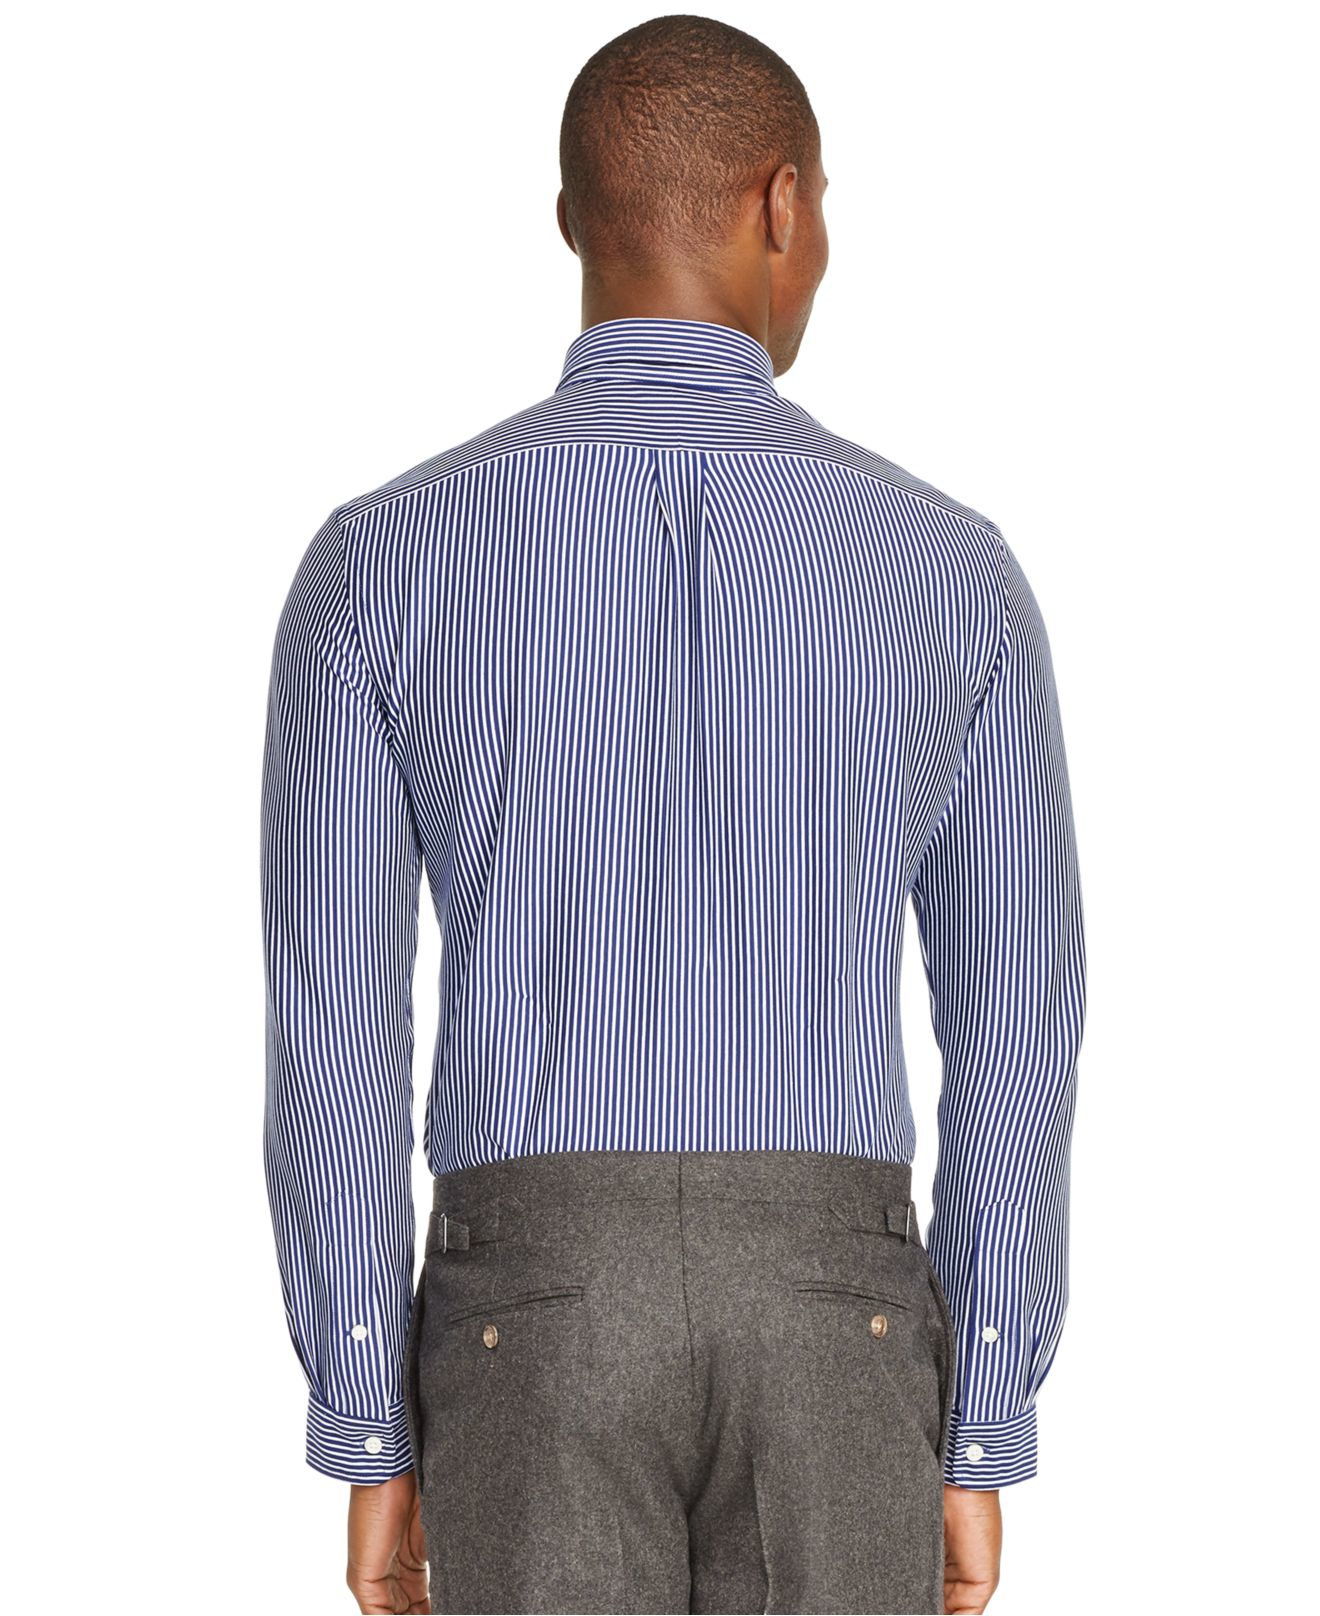 polo ralph lauren striped knit dress shirt in blue for men